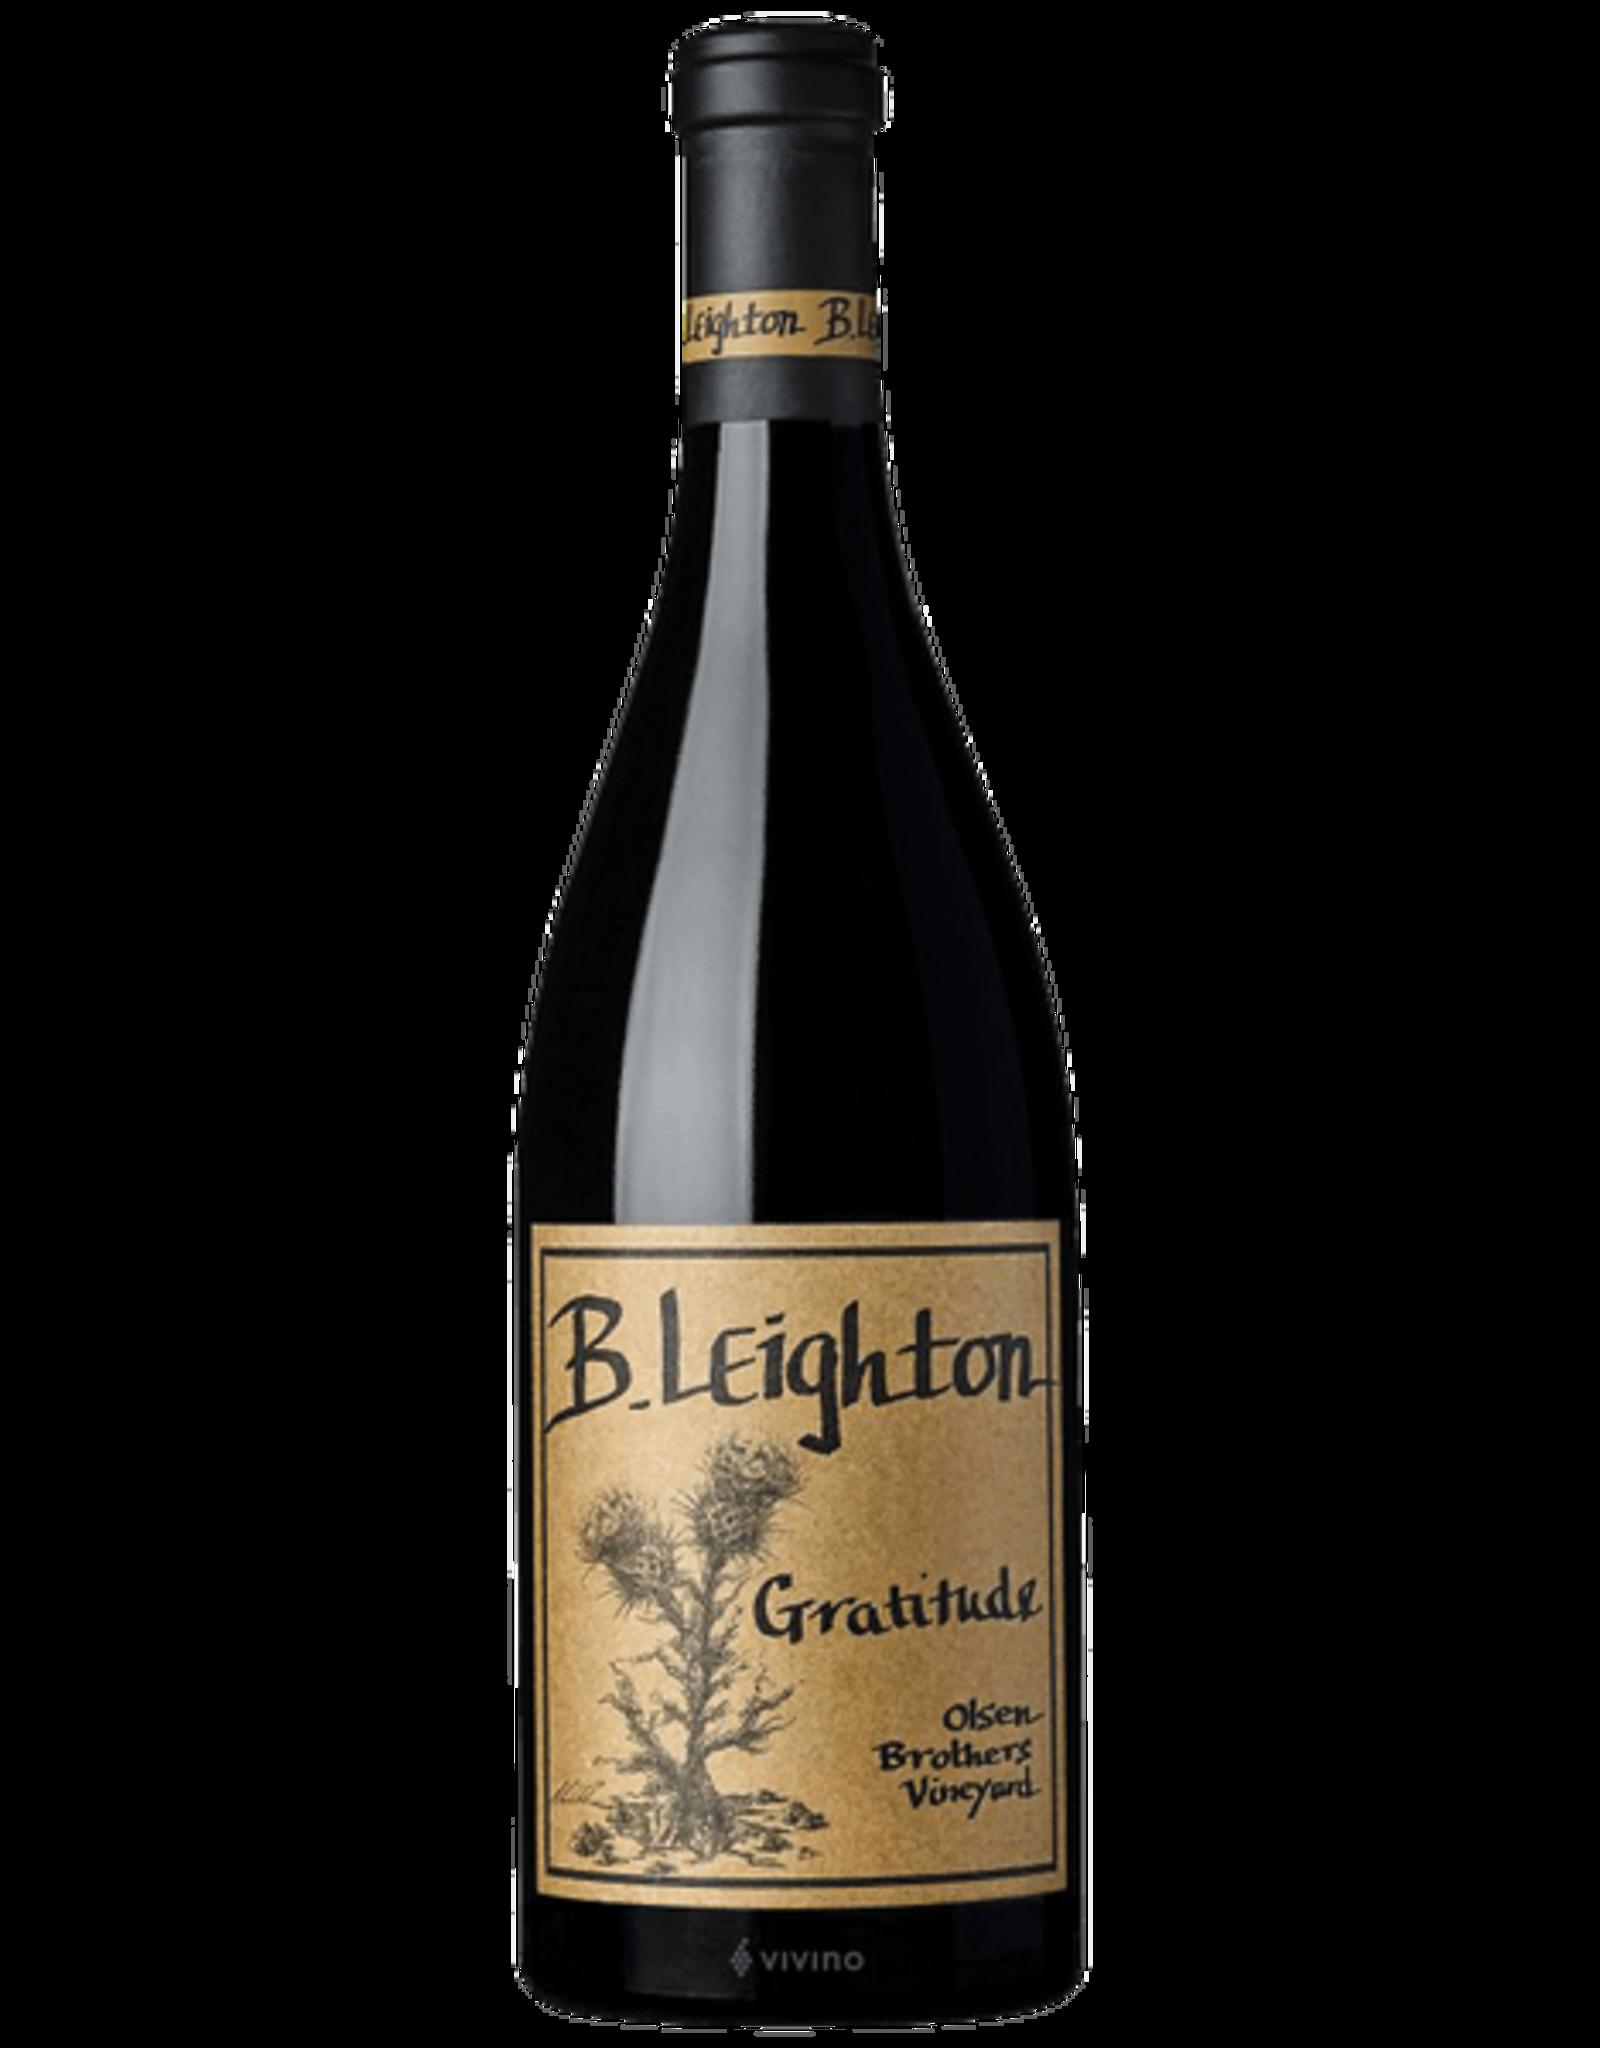 B Leighton Gratitude 2016 Olsen Brothers Vineyard